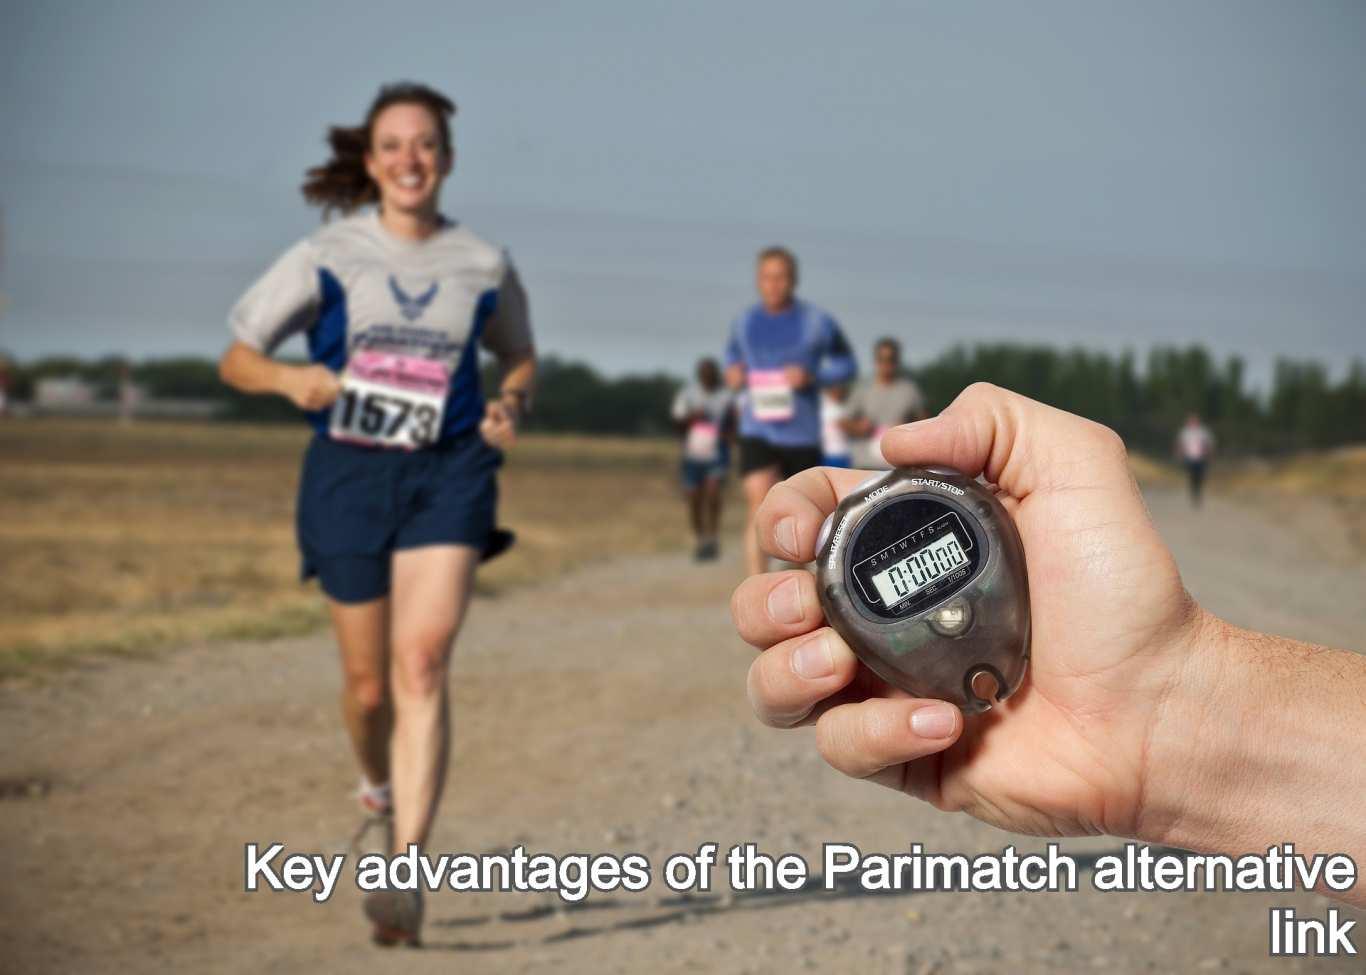 Key advantages of the Parimatch alternative link